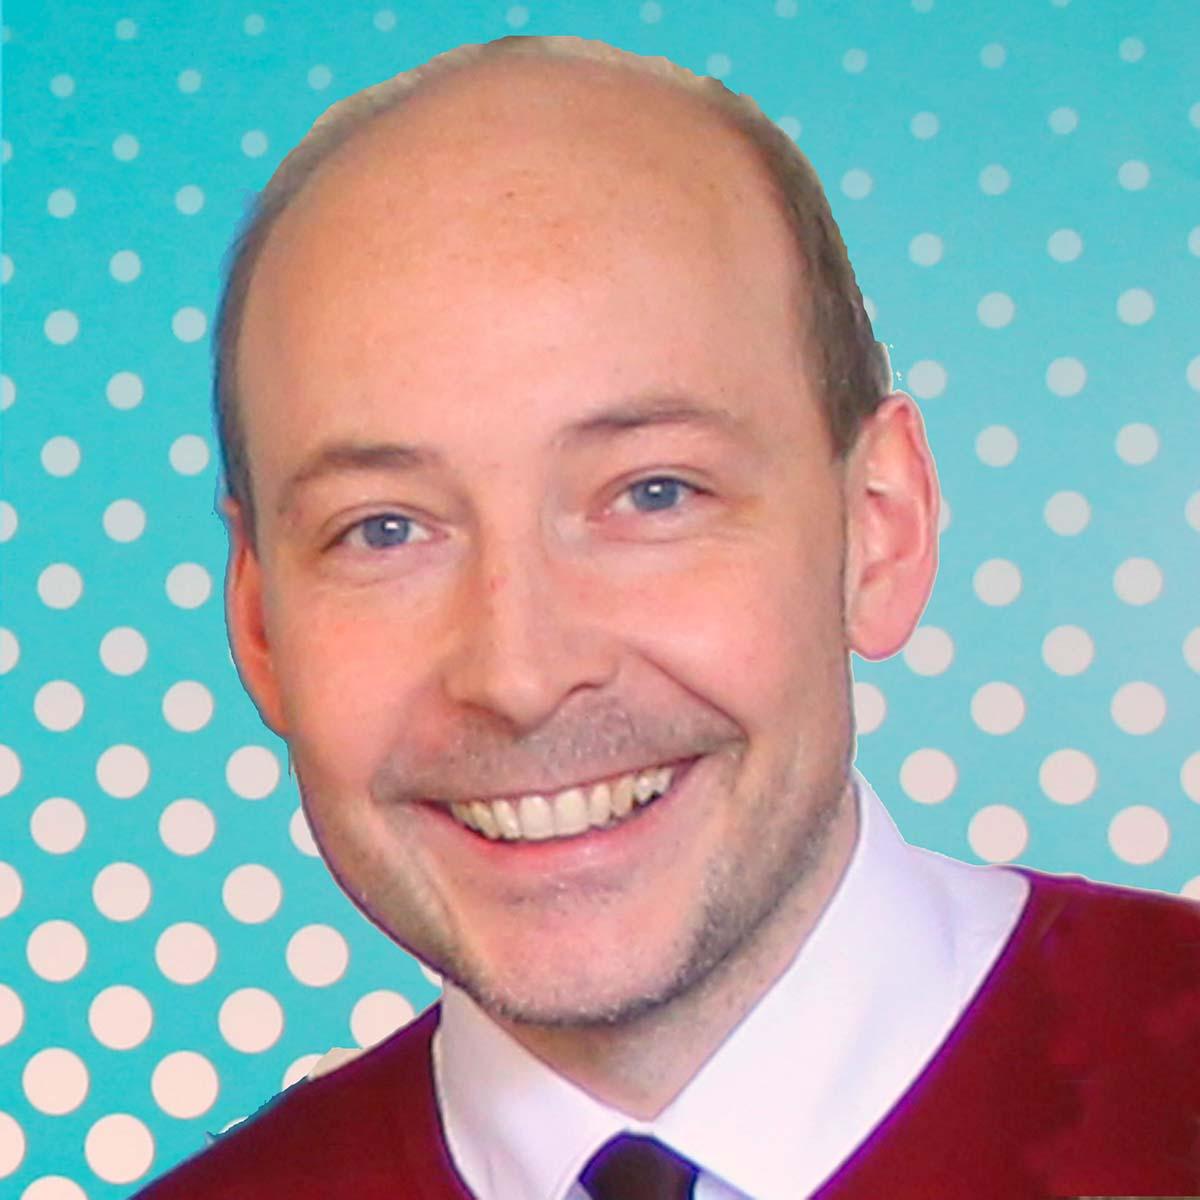 Leiter: Dr. Markus Ehm